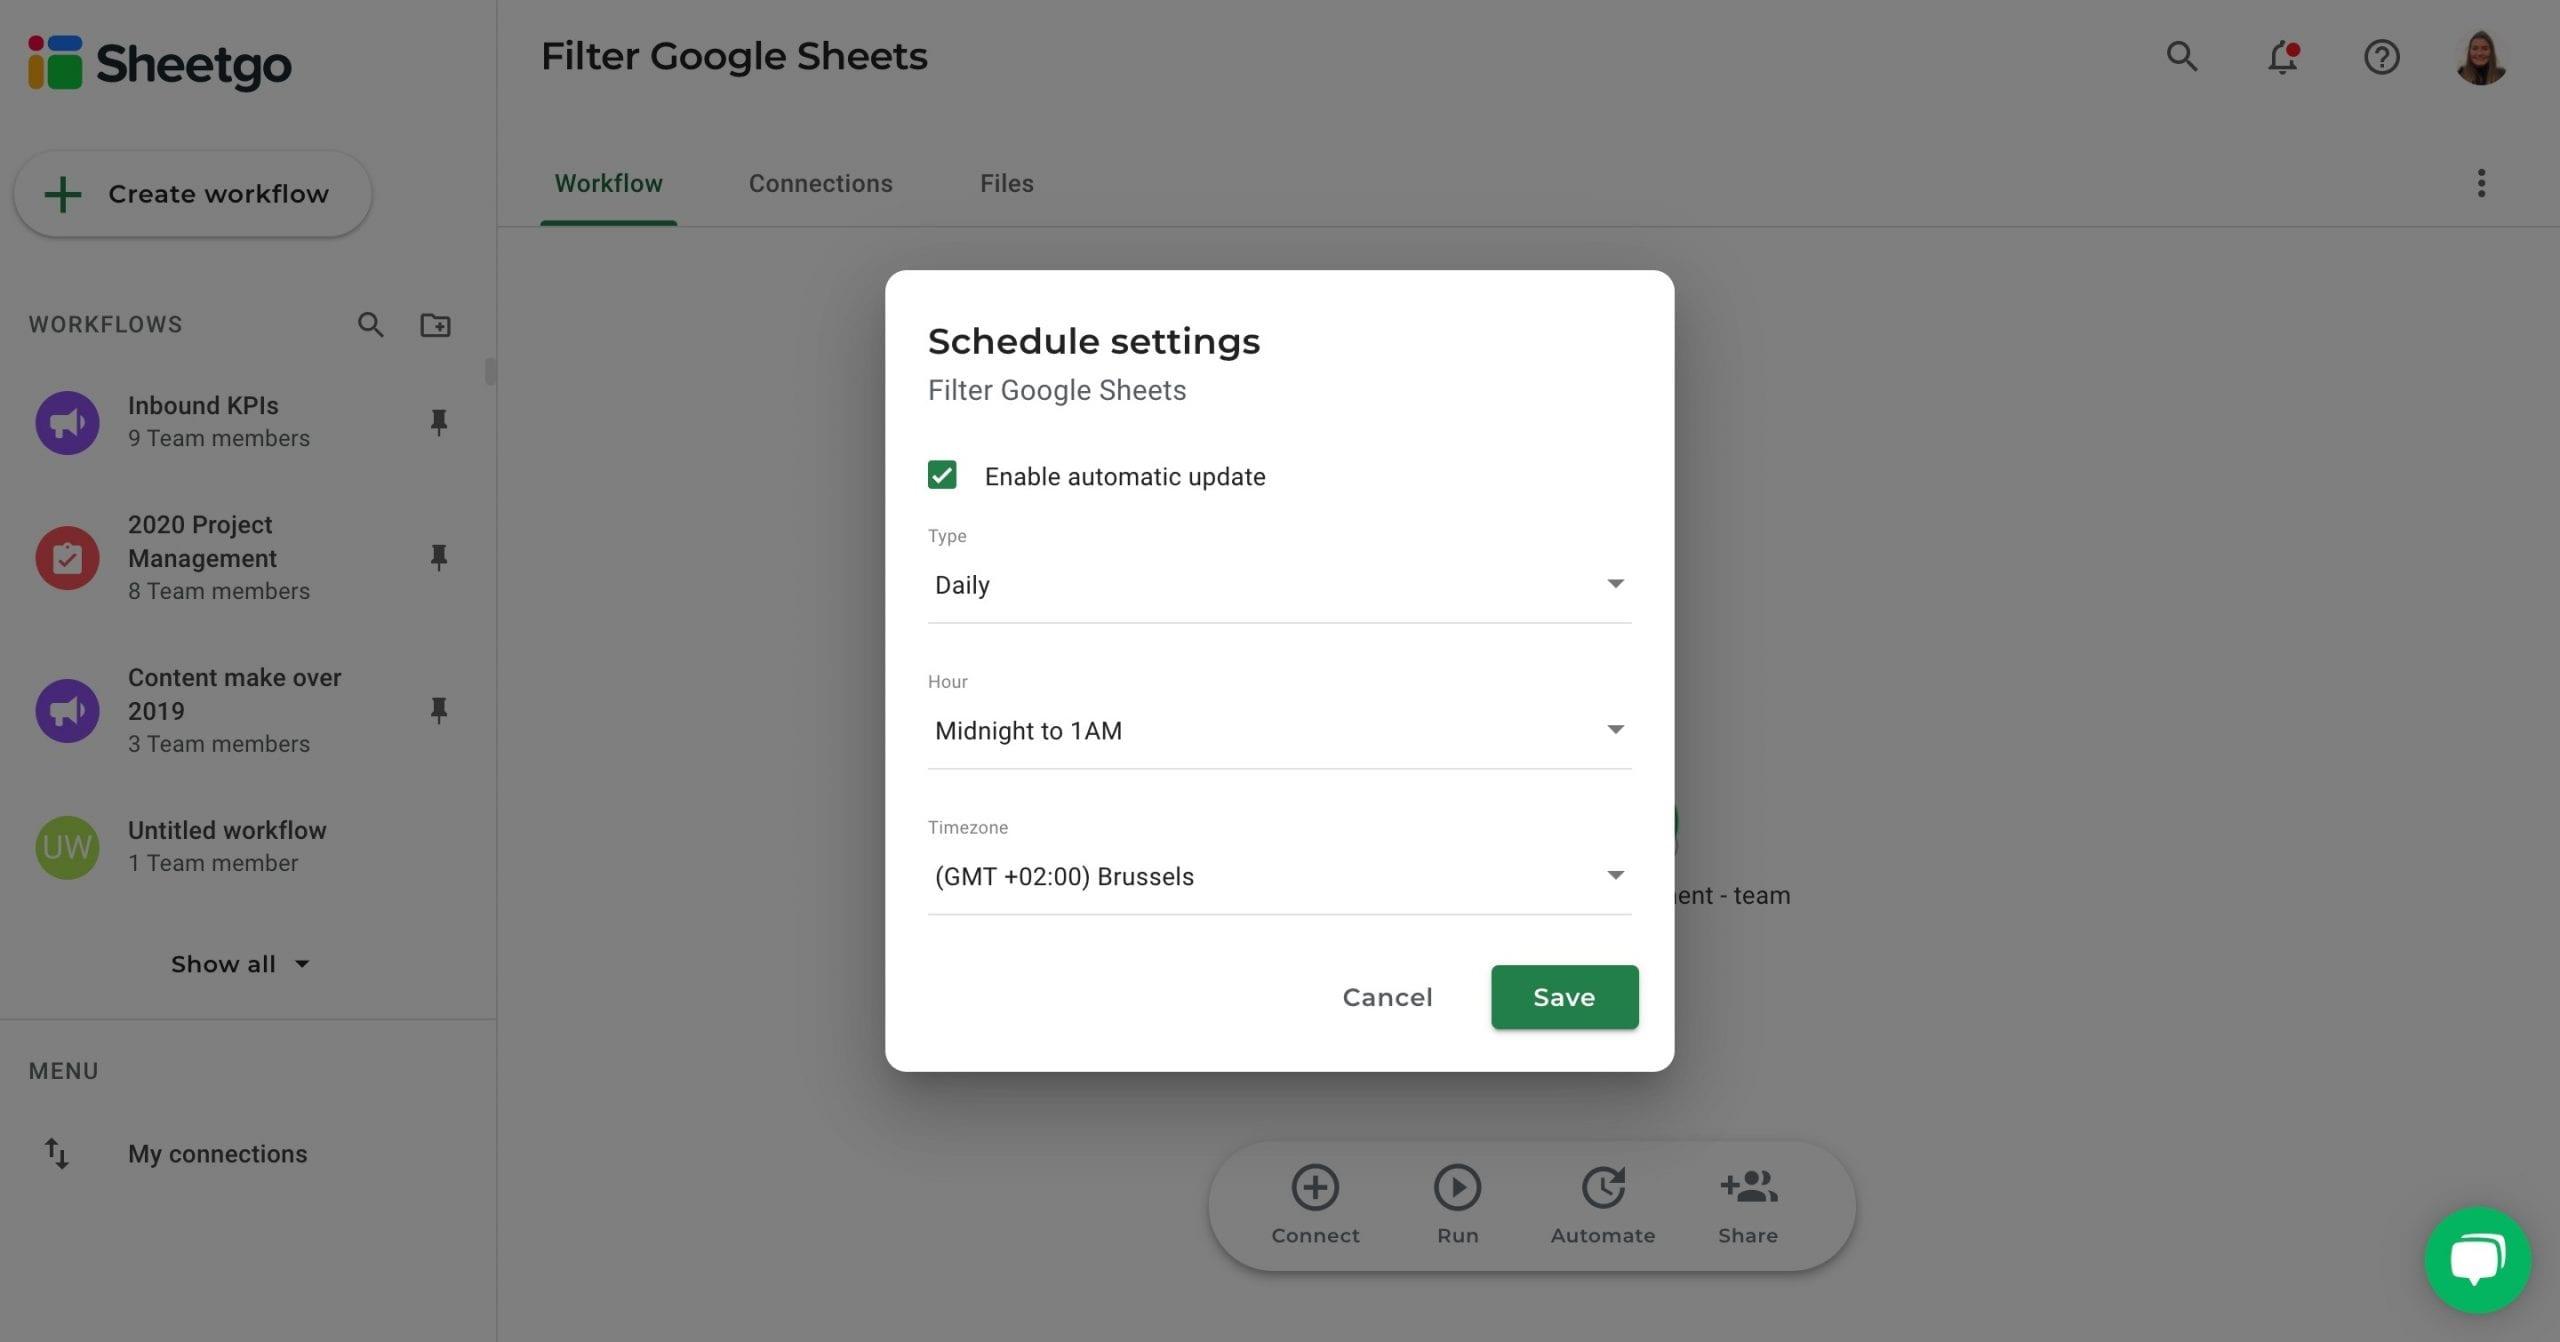 Filter Google Sheets Sheetgo automatic updates